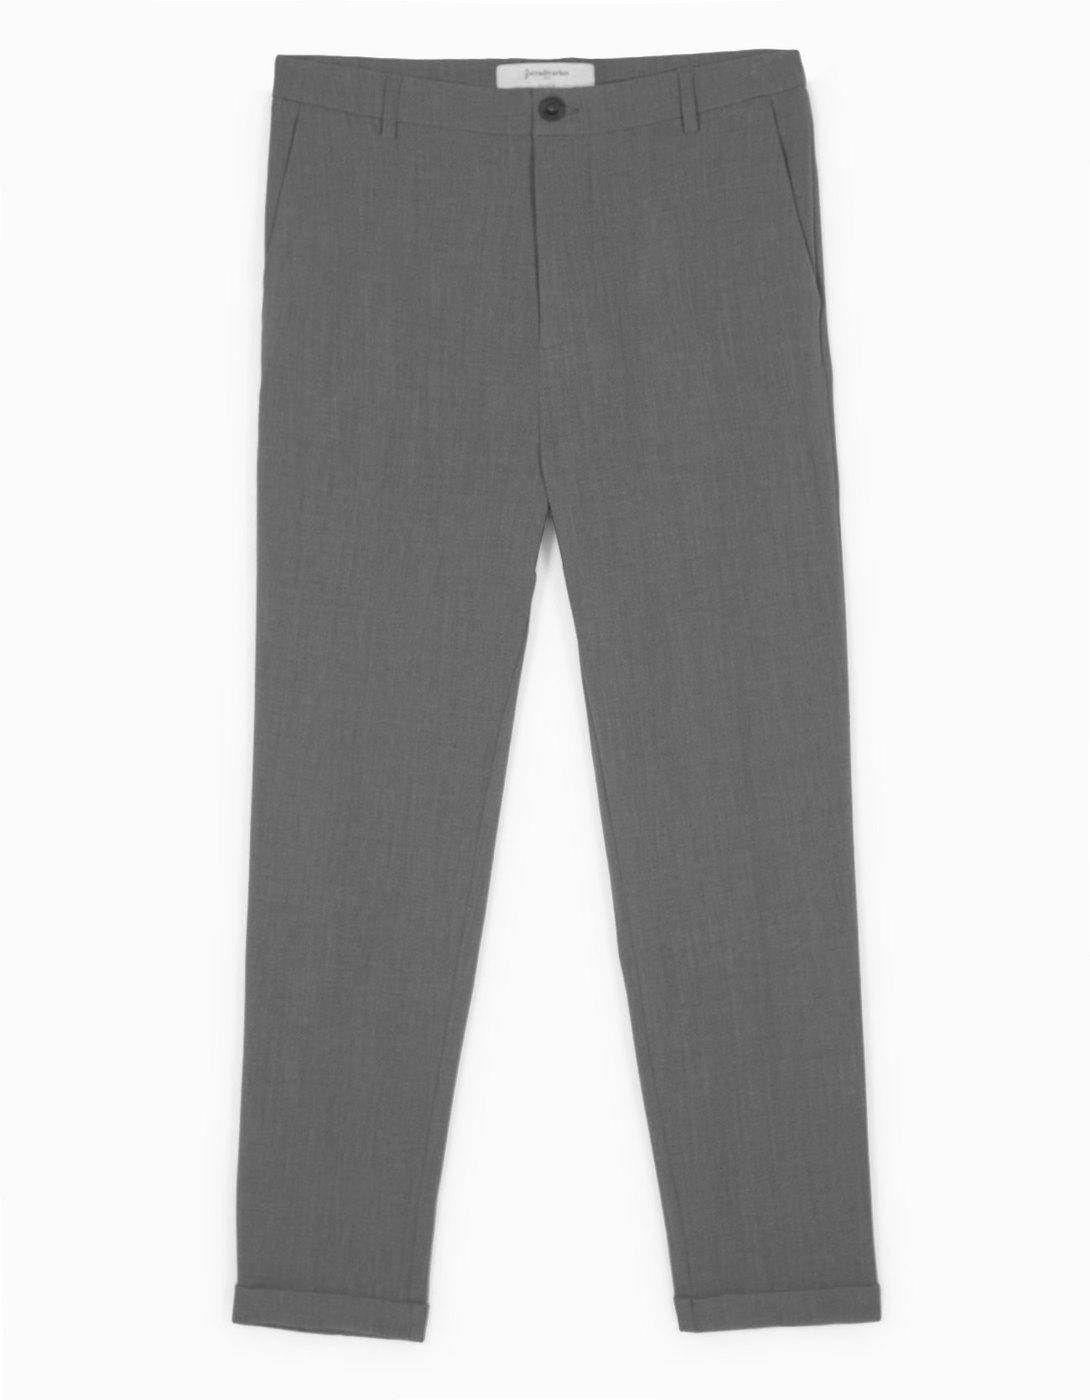 Stradivarius Grey Trousers